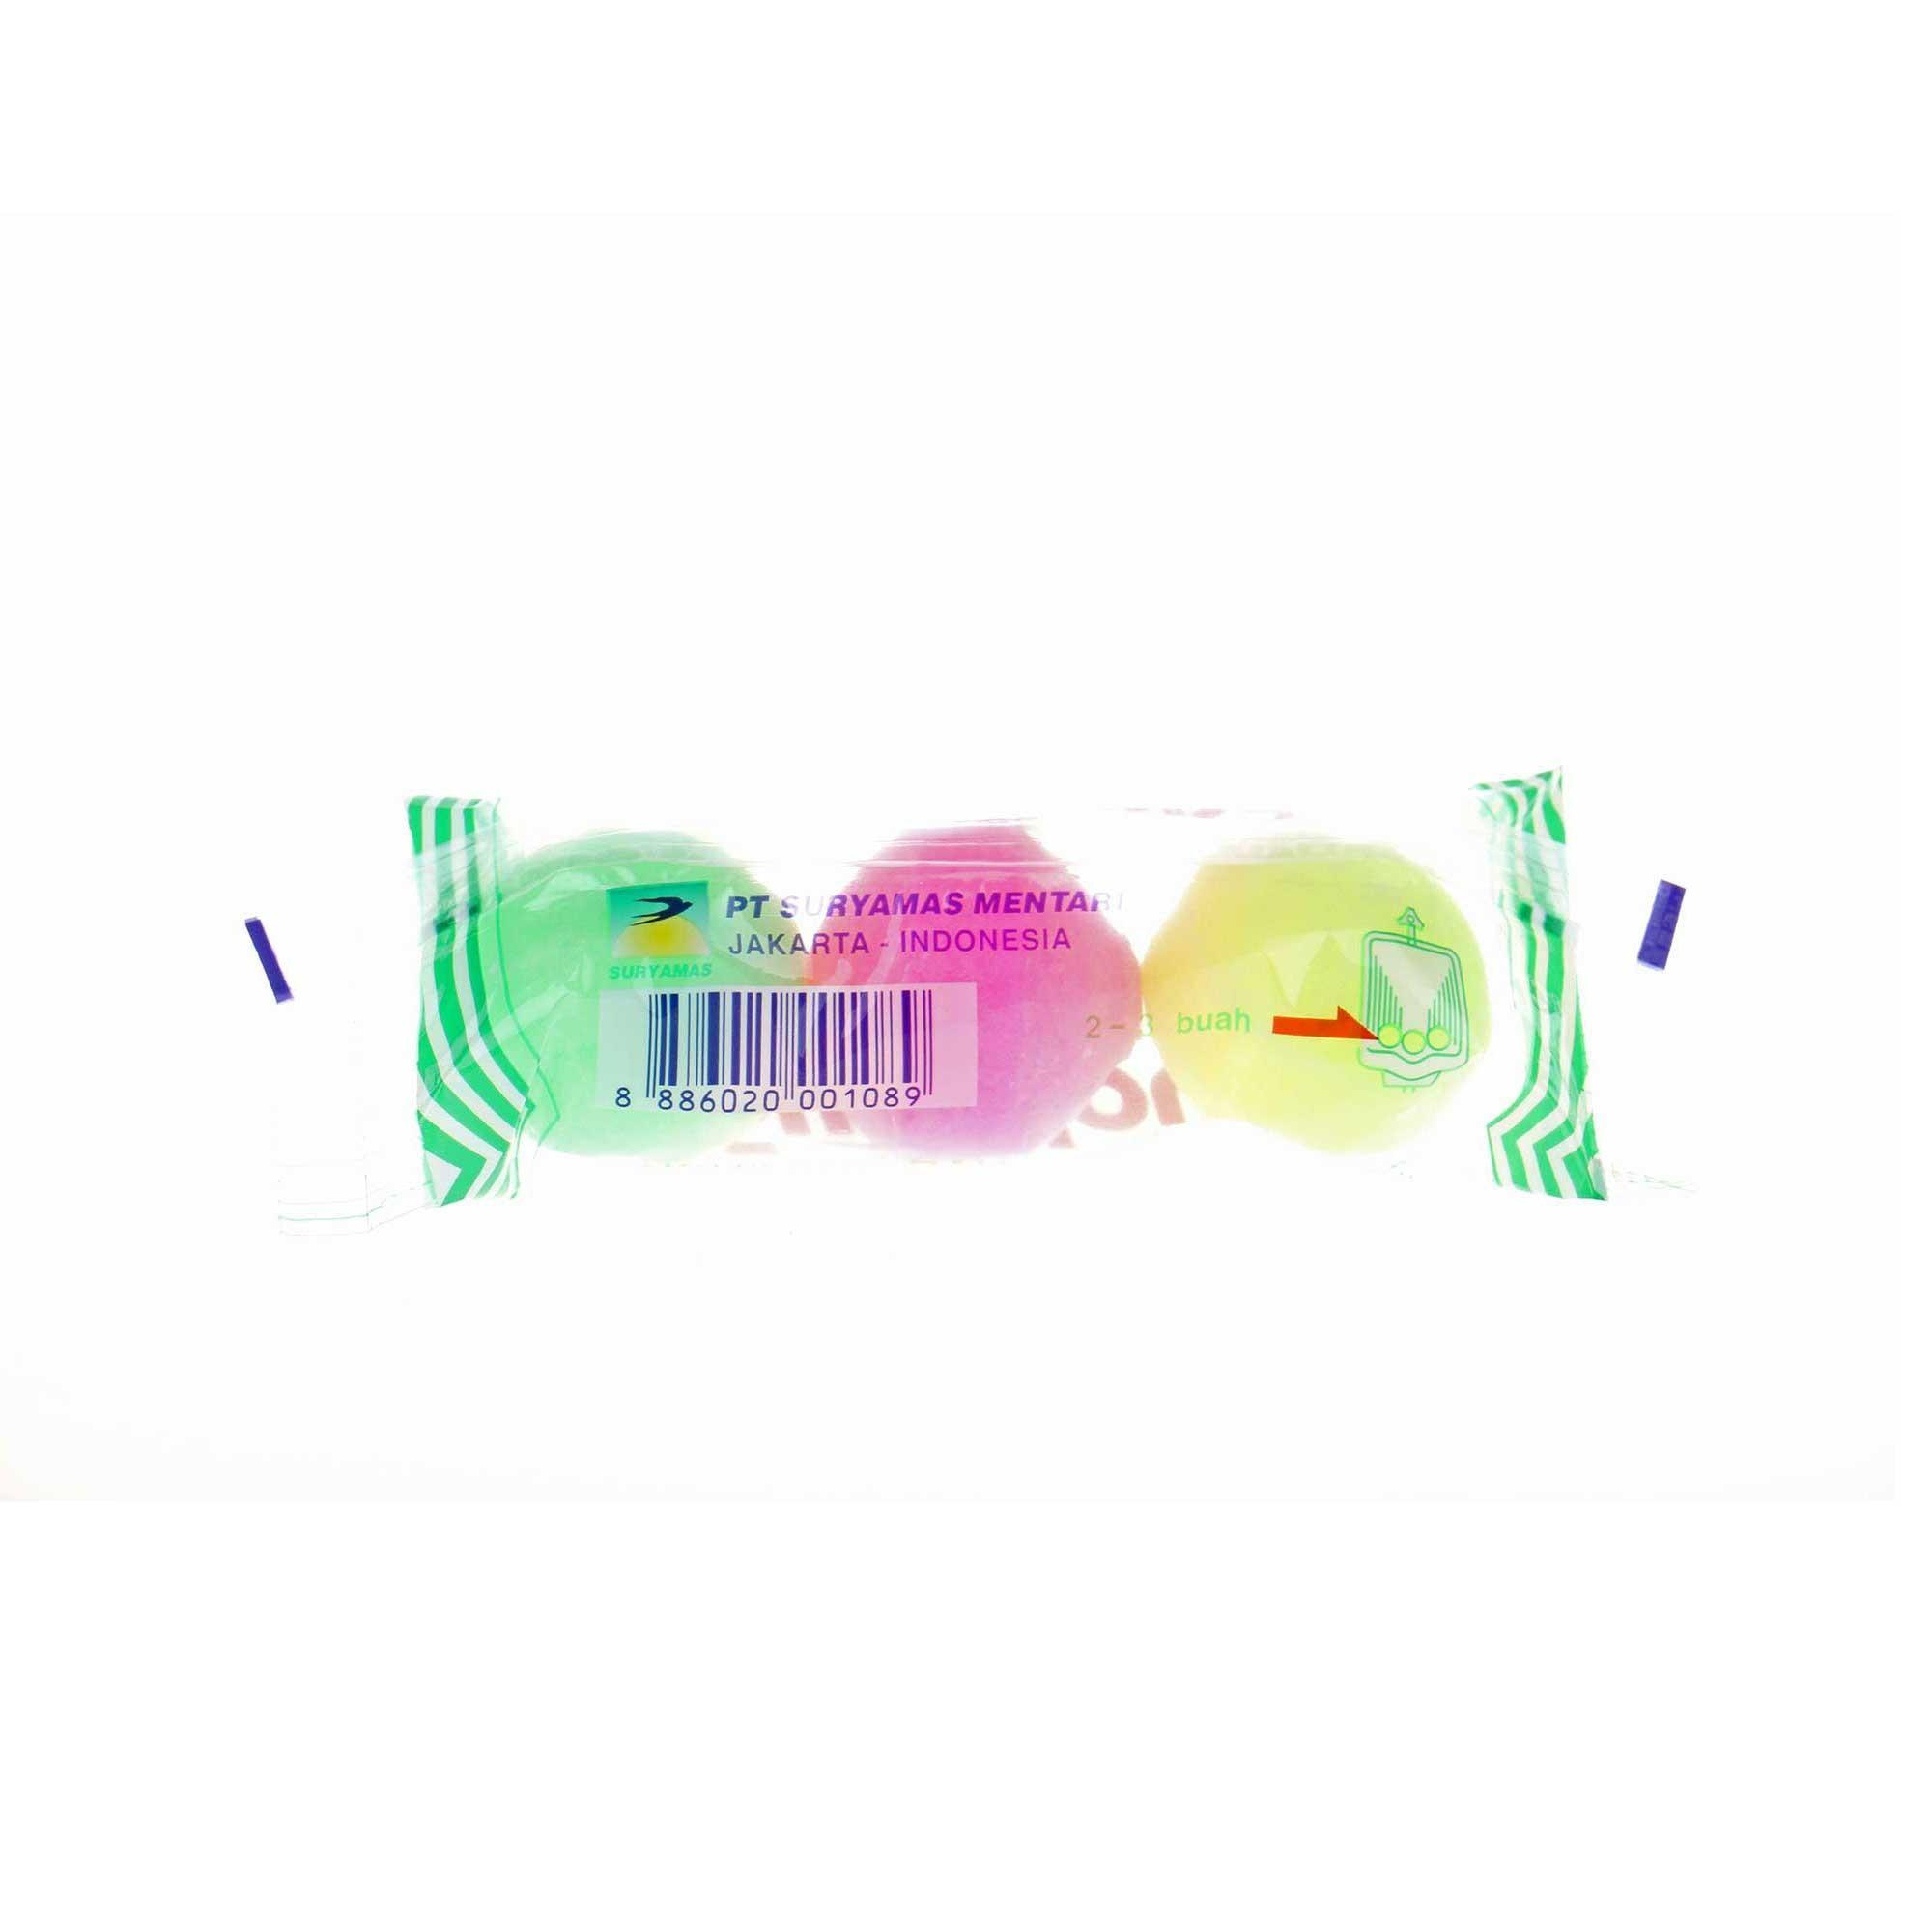 Kehebatan Swallow Kamper Toilet Colour Ball 5 Pcs Dan Harga Update Hpr009 Bola Karet Pencuci Baju Clean Laundry 3pcs